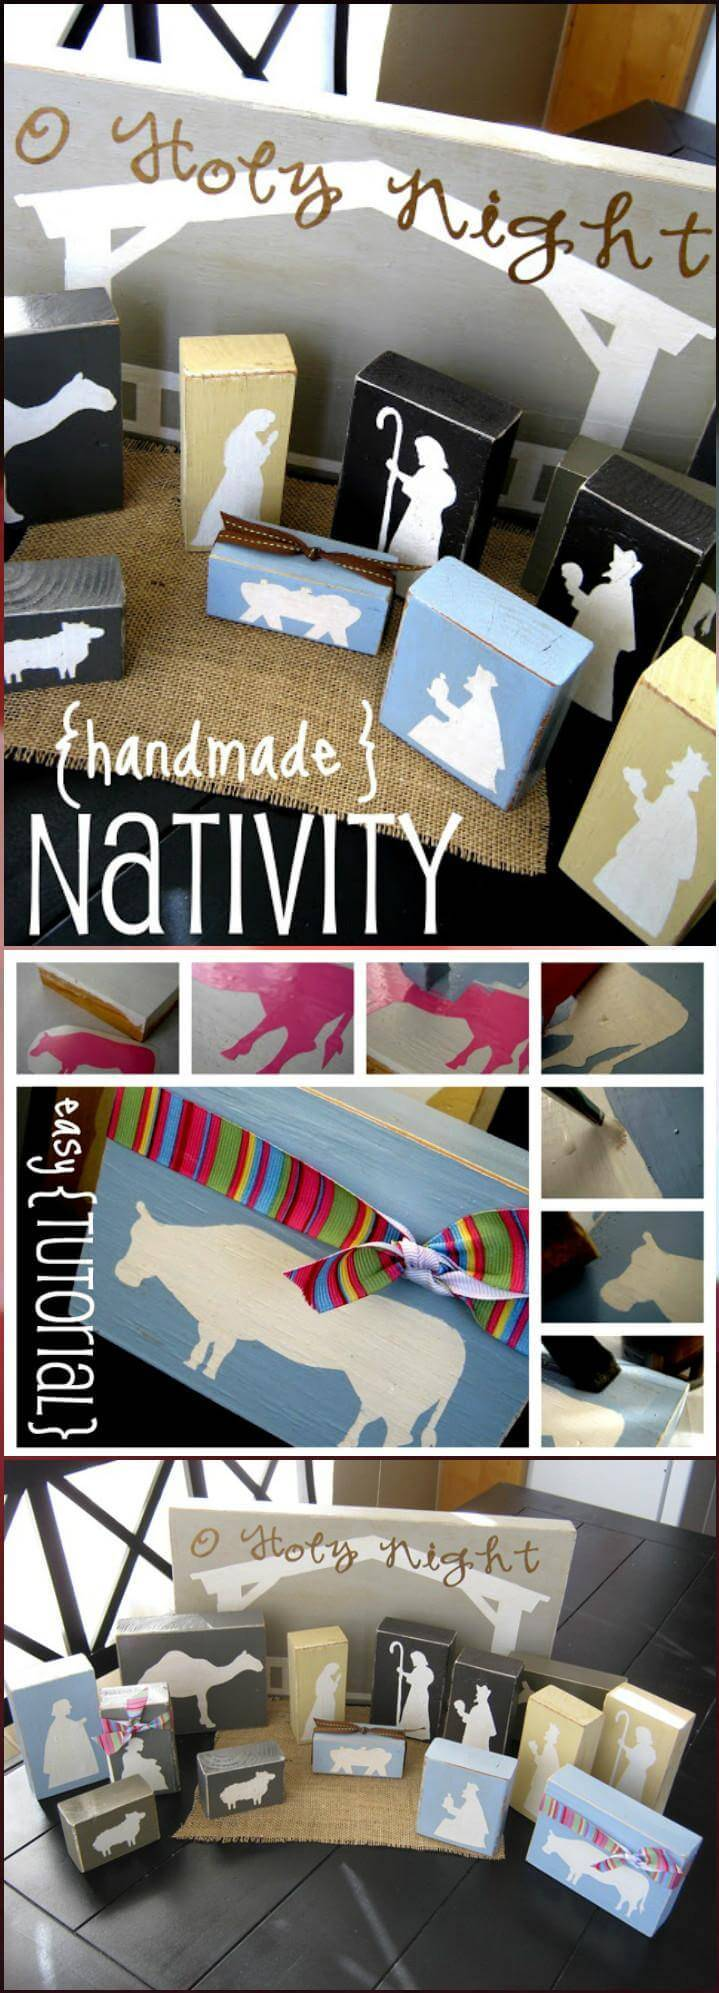 self-made vinyl omtwi finale block nativity set